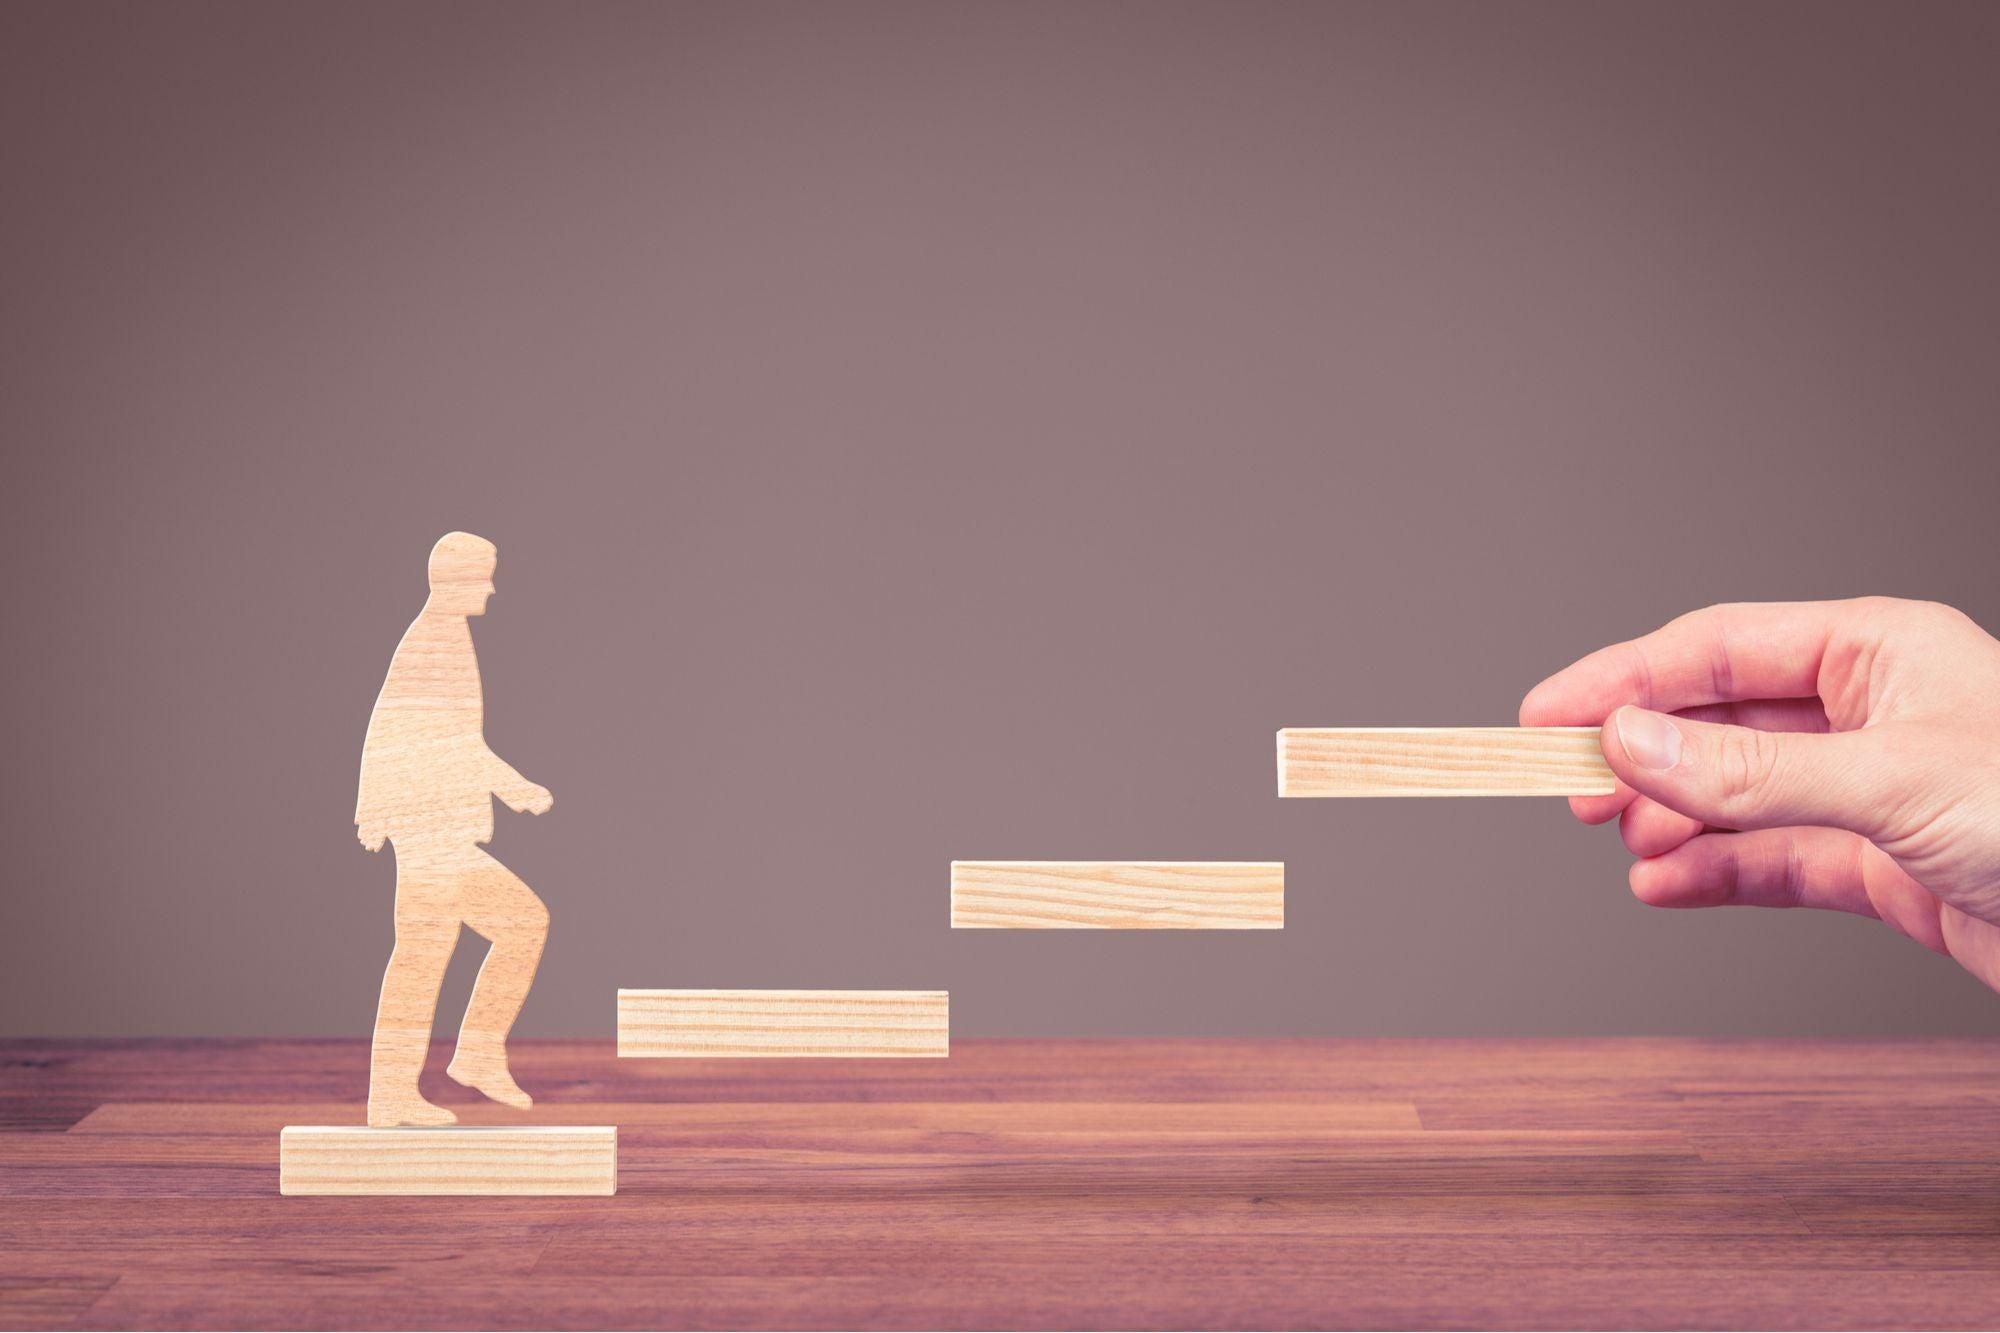 entrepreneur.com - Nour Al Hassan - Never Stop Learning: How Self-Education Is The Key To Success For Entrepreneurs